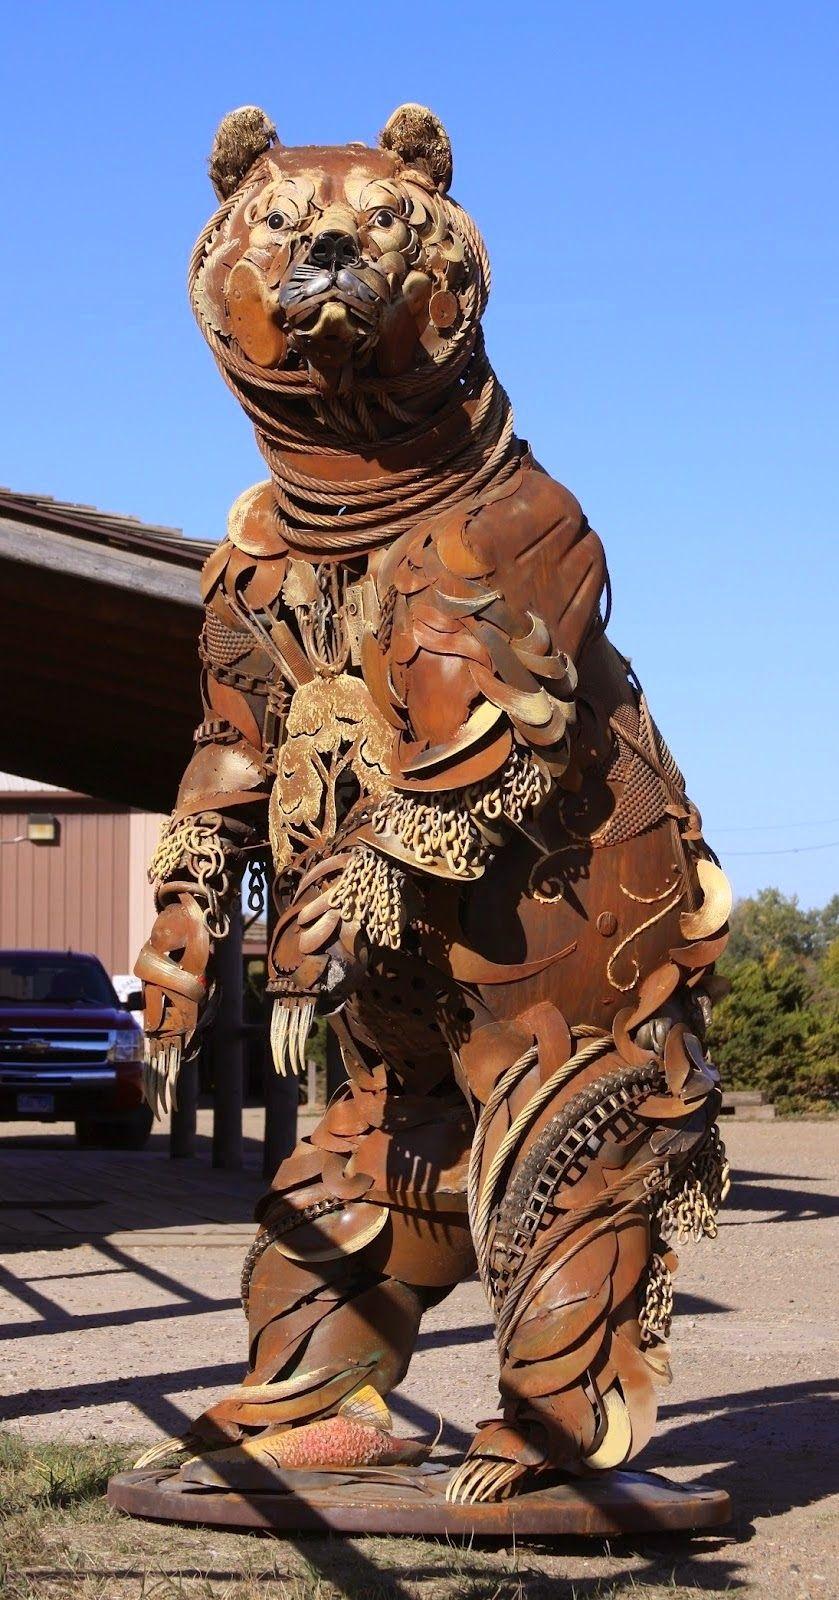 Simply Creative: Scrap Metal Animal Sculptures by John Lopez | Art ...